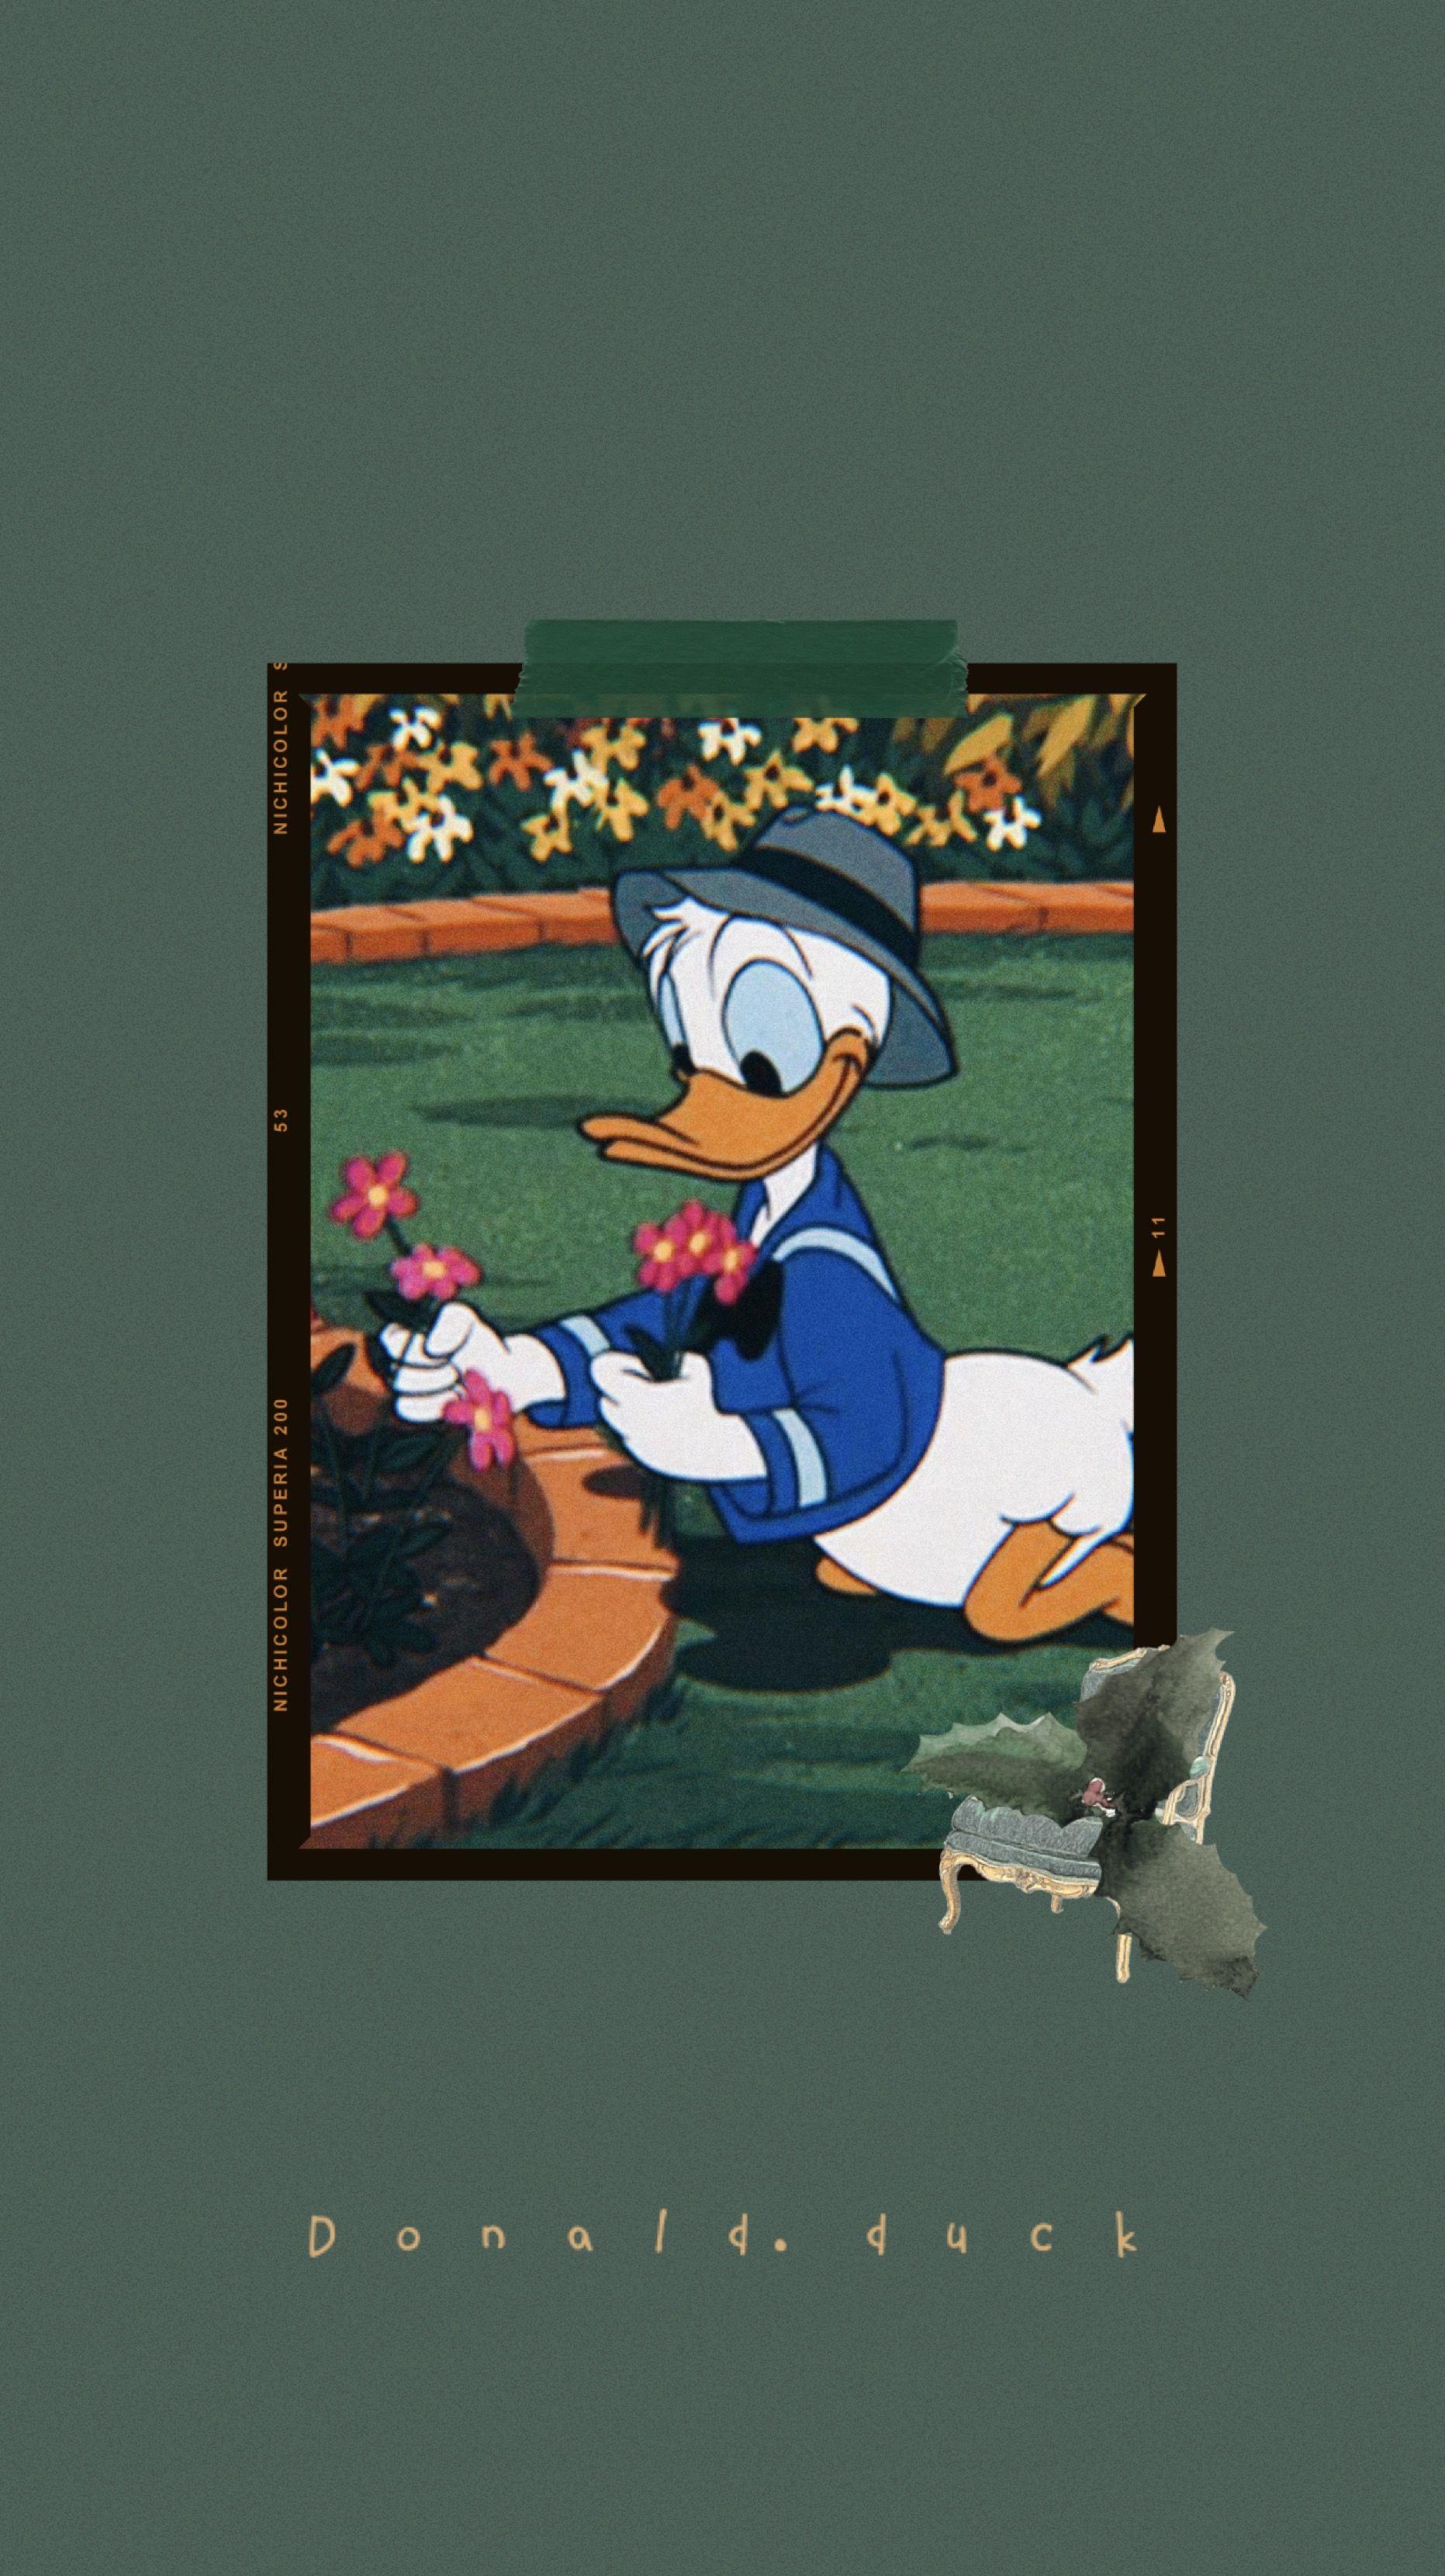 Donald Duck Wallpaper Aesthetic Duck Wallpaper Cartoon Wallpaper Cute Cartoon Wallpapers